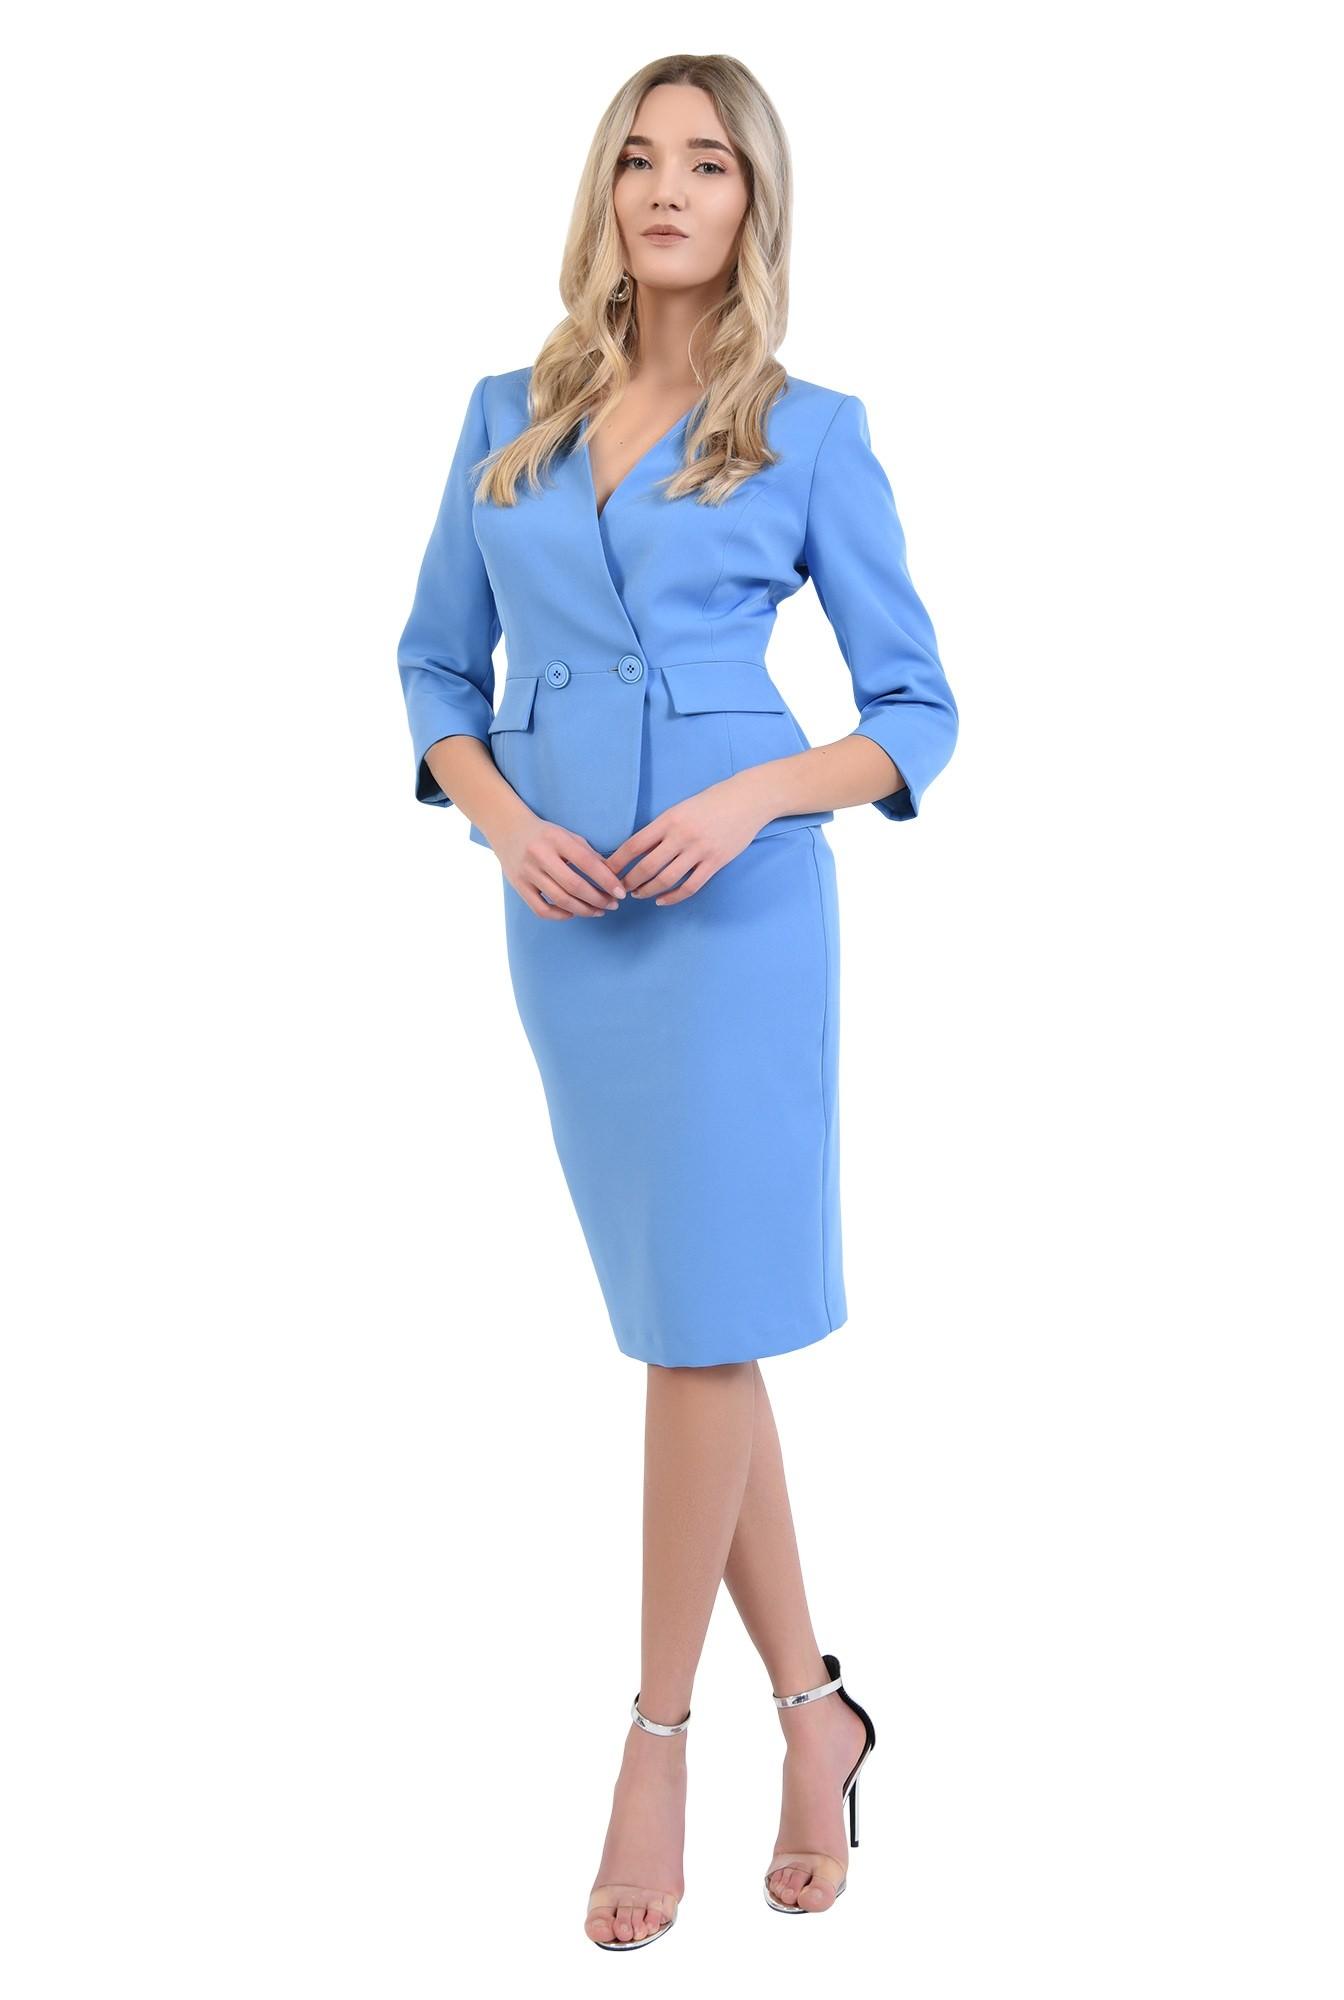 3 - 360 - sacou bleu, office, costum, buzunare cu clapa, anchior petrecut